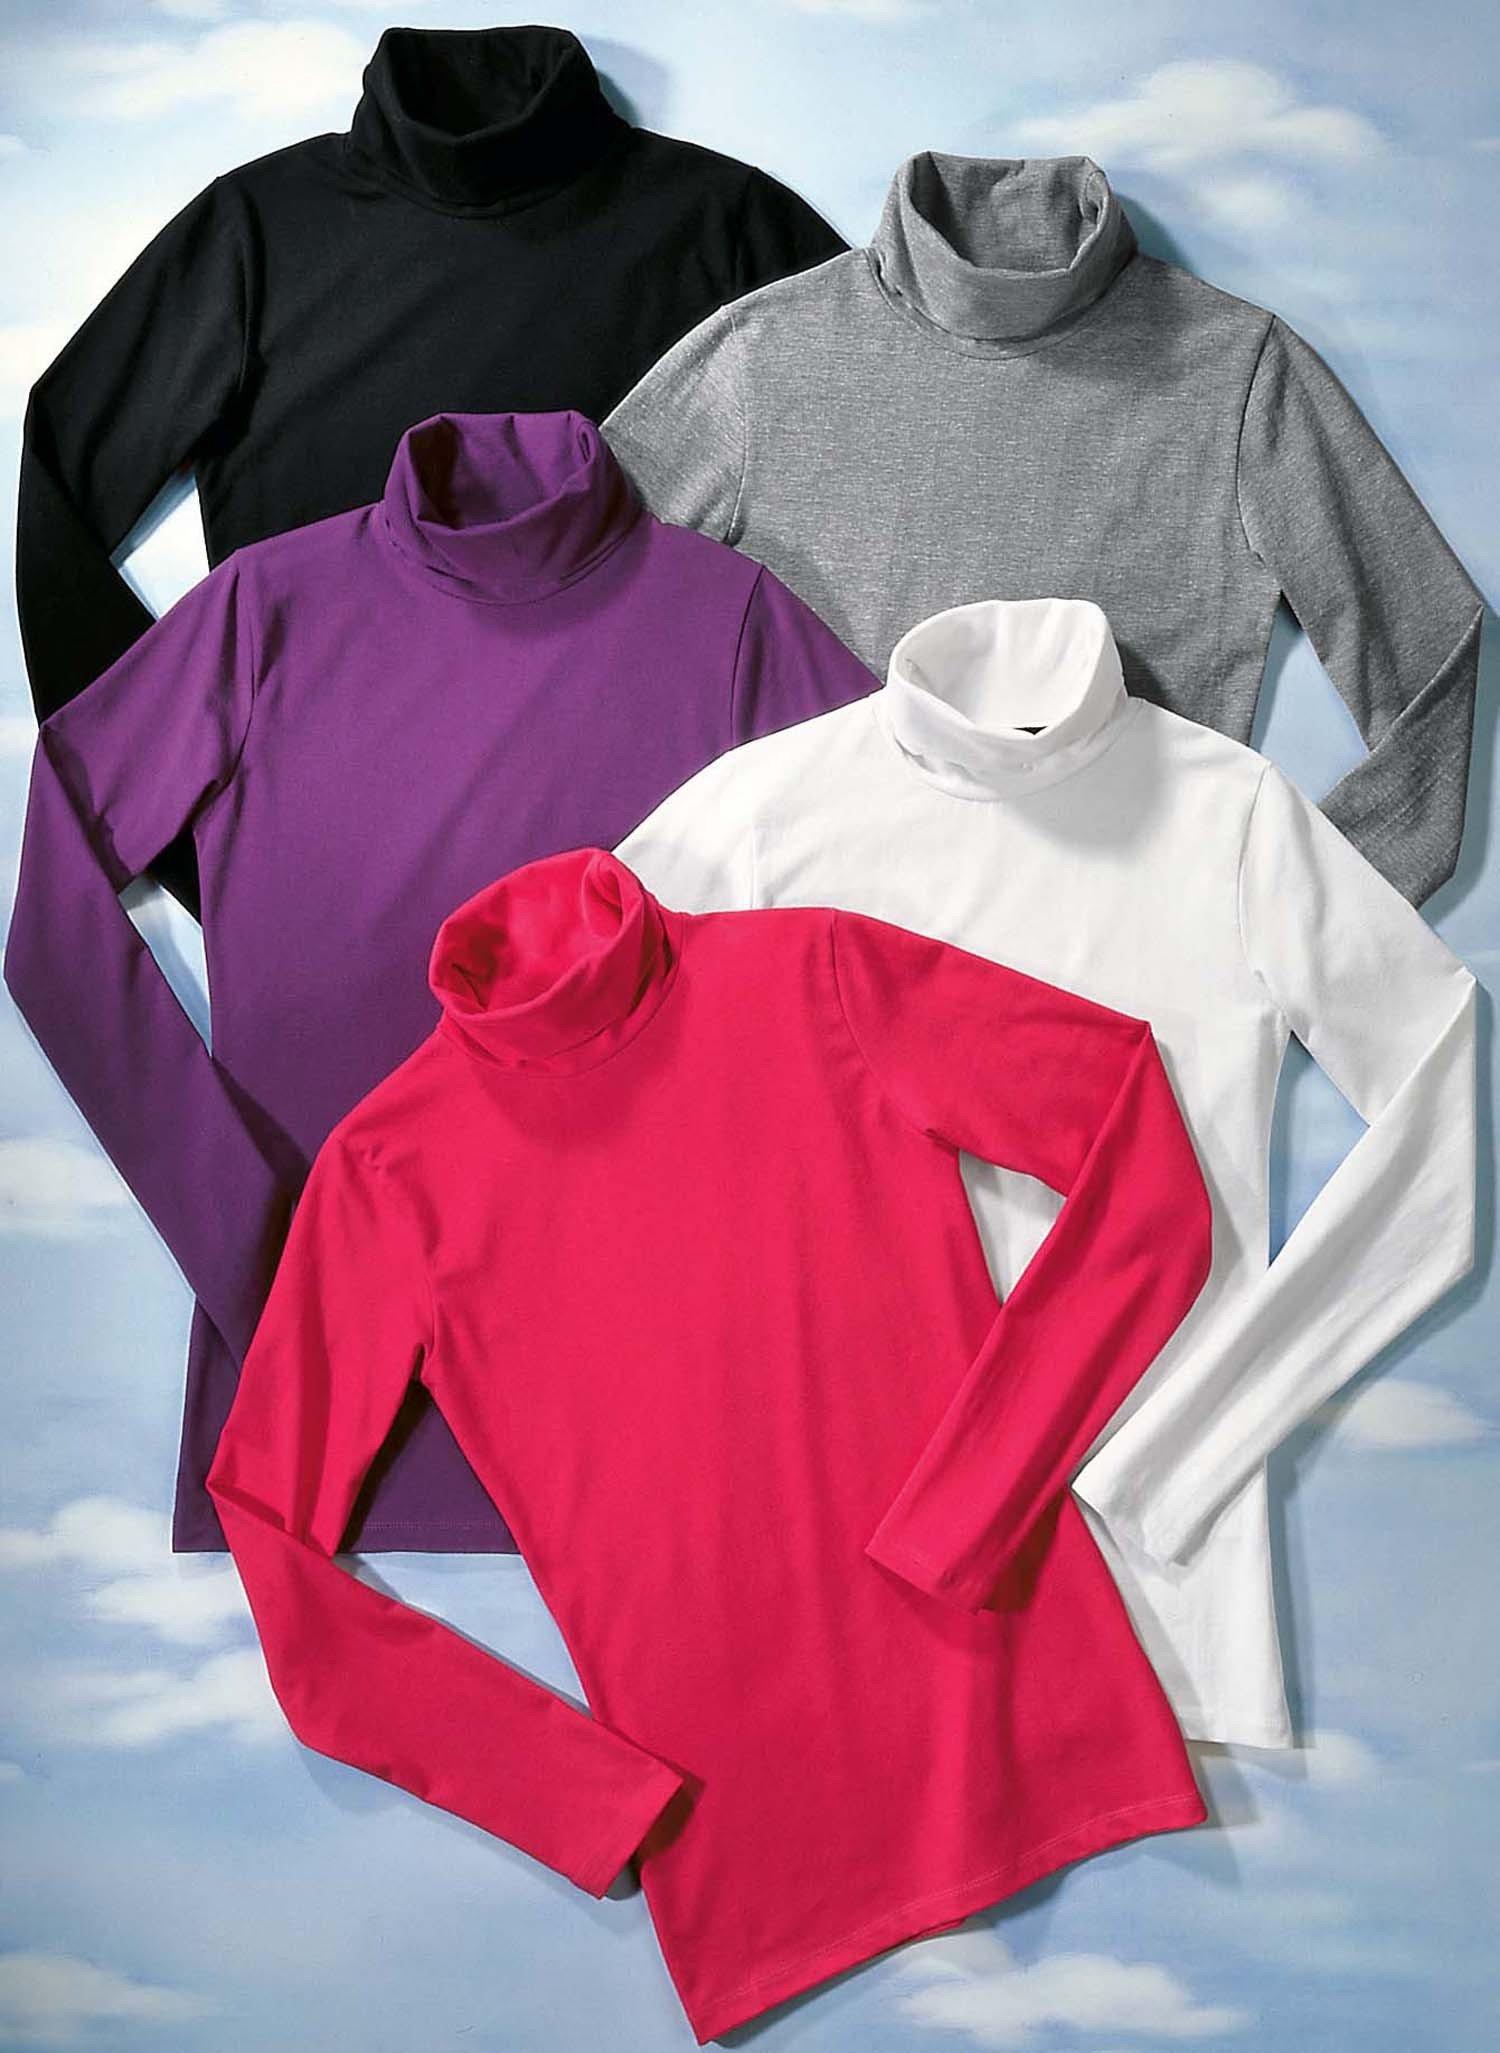 D-LA-Rolli-Shirt,uni schwarz L 010 - 2 - Ronja.ch